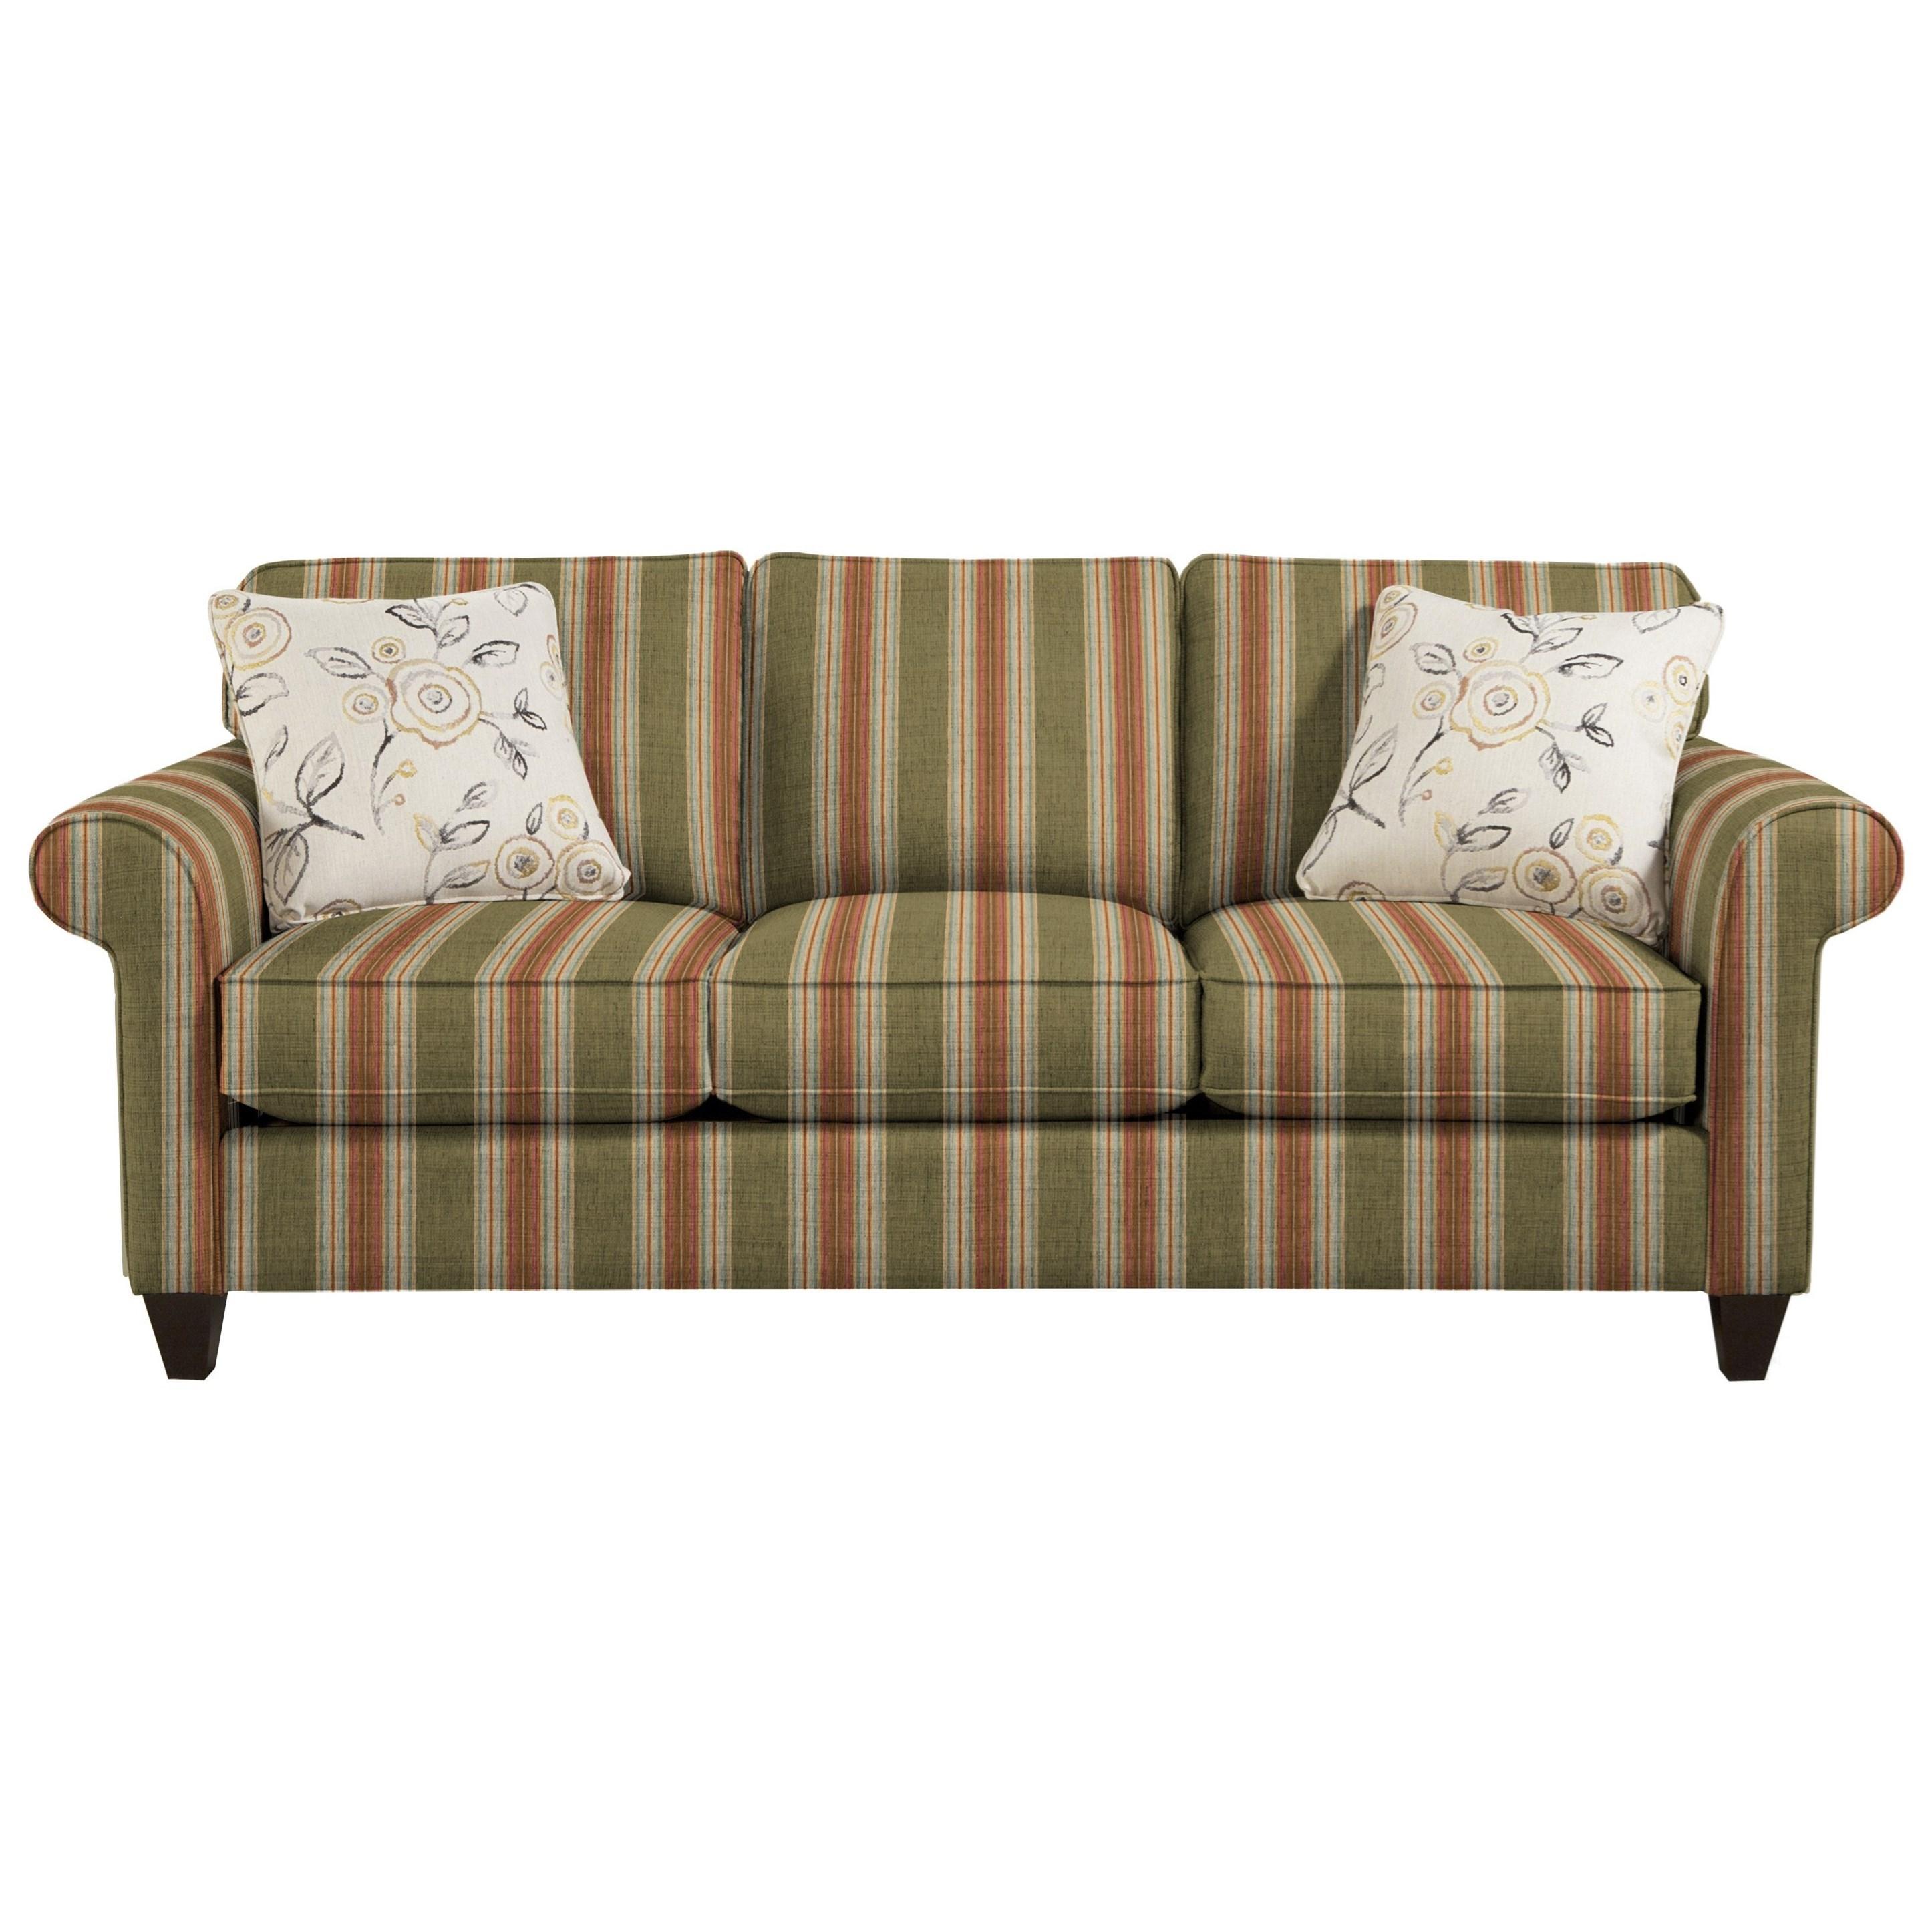 7421 Sofa by Hickorycraft at Johnny Janosik